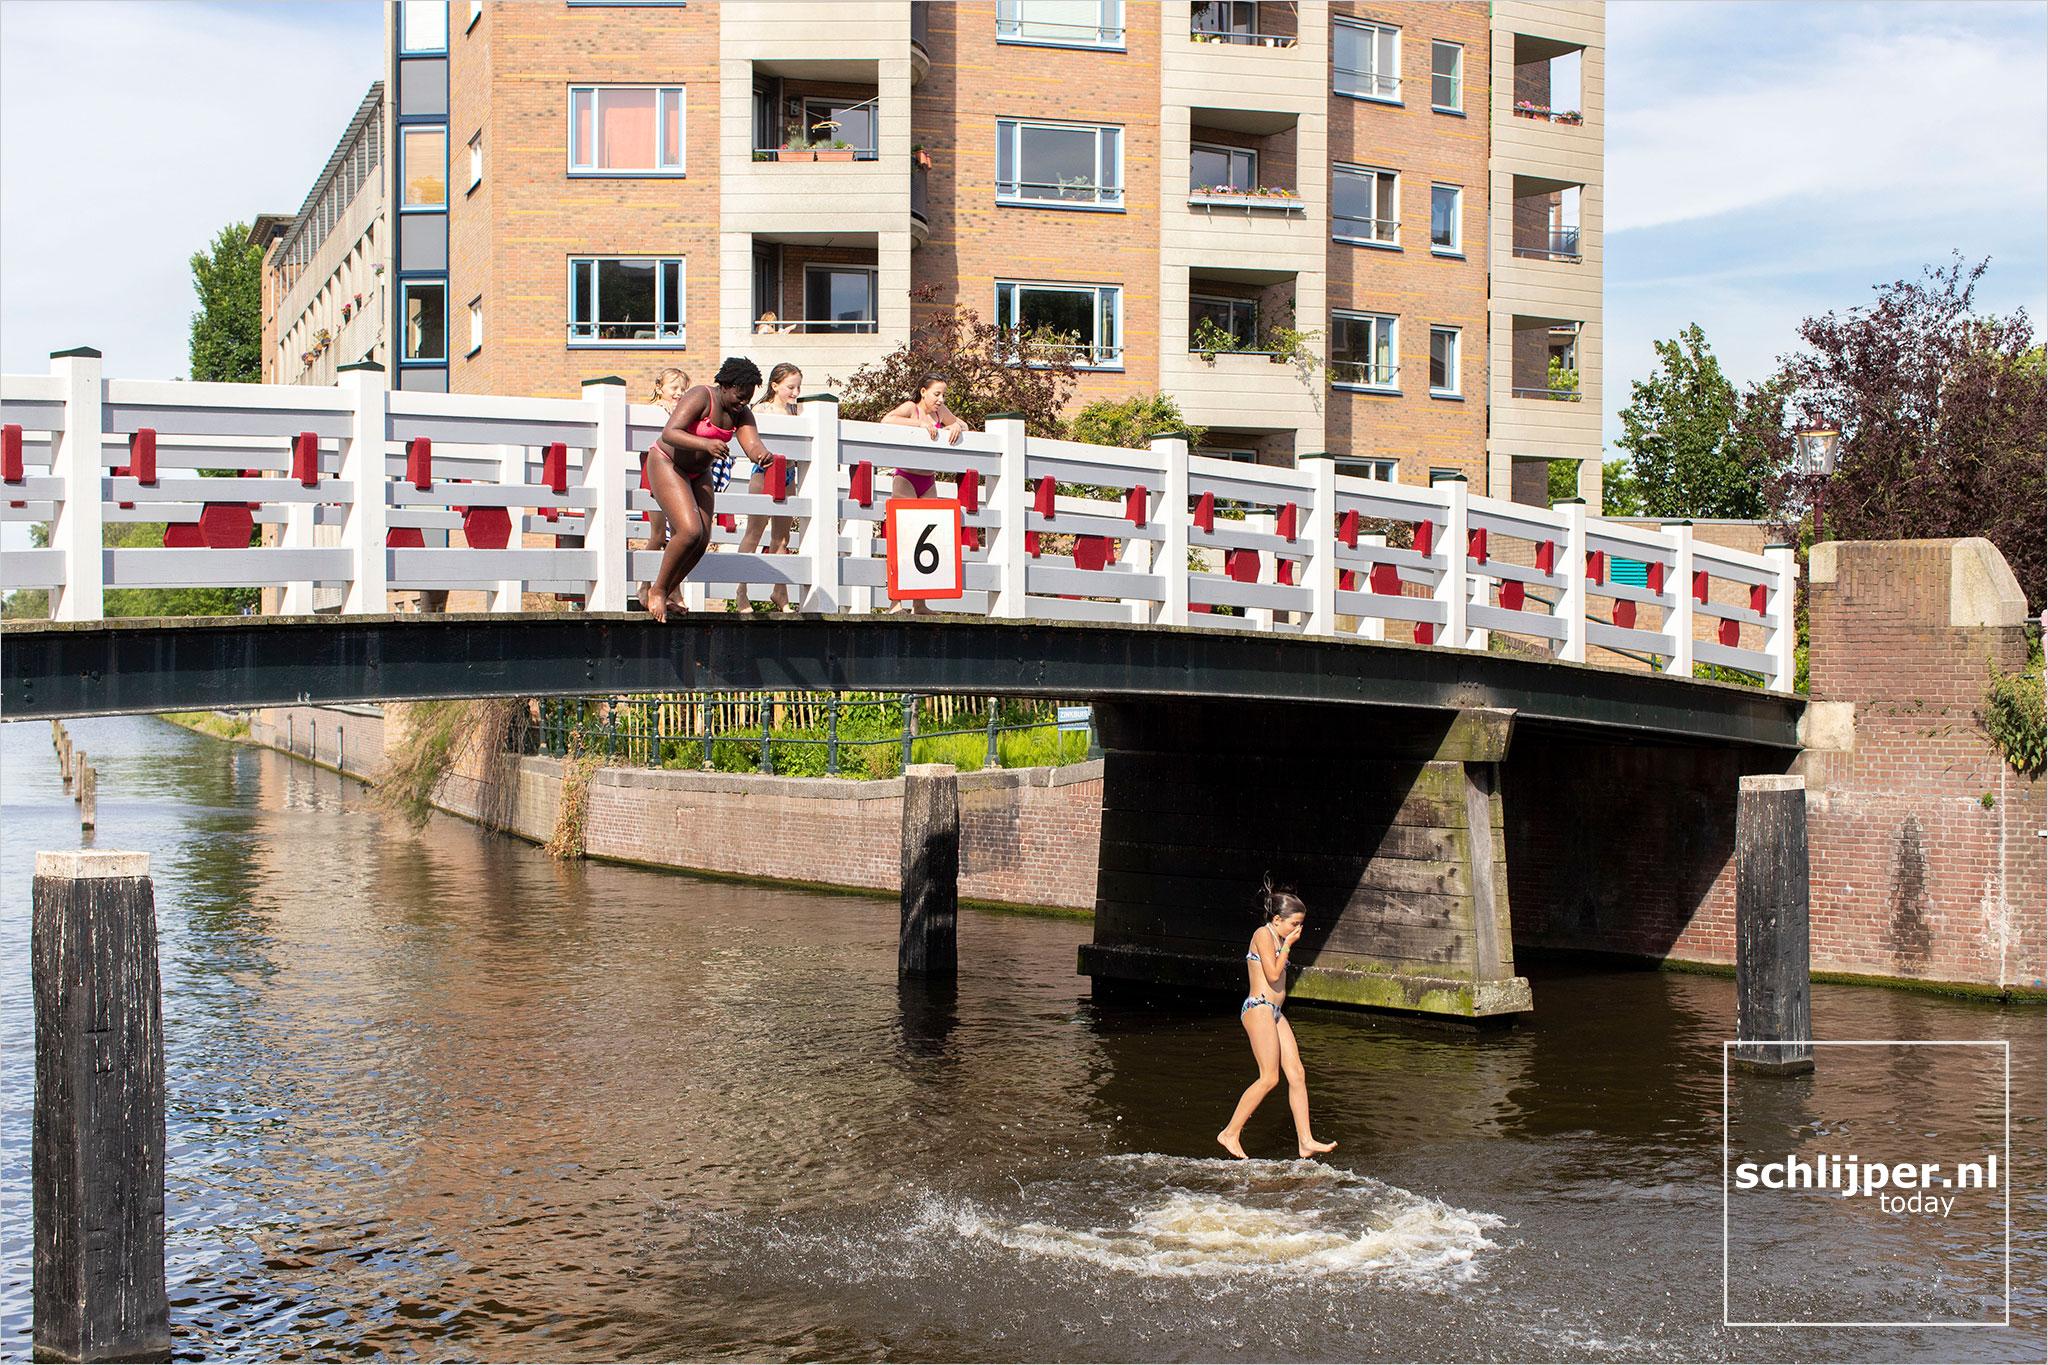 The Netherlands, Amsterdam, 11 juni 2021